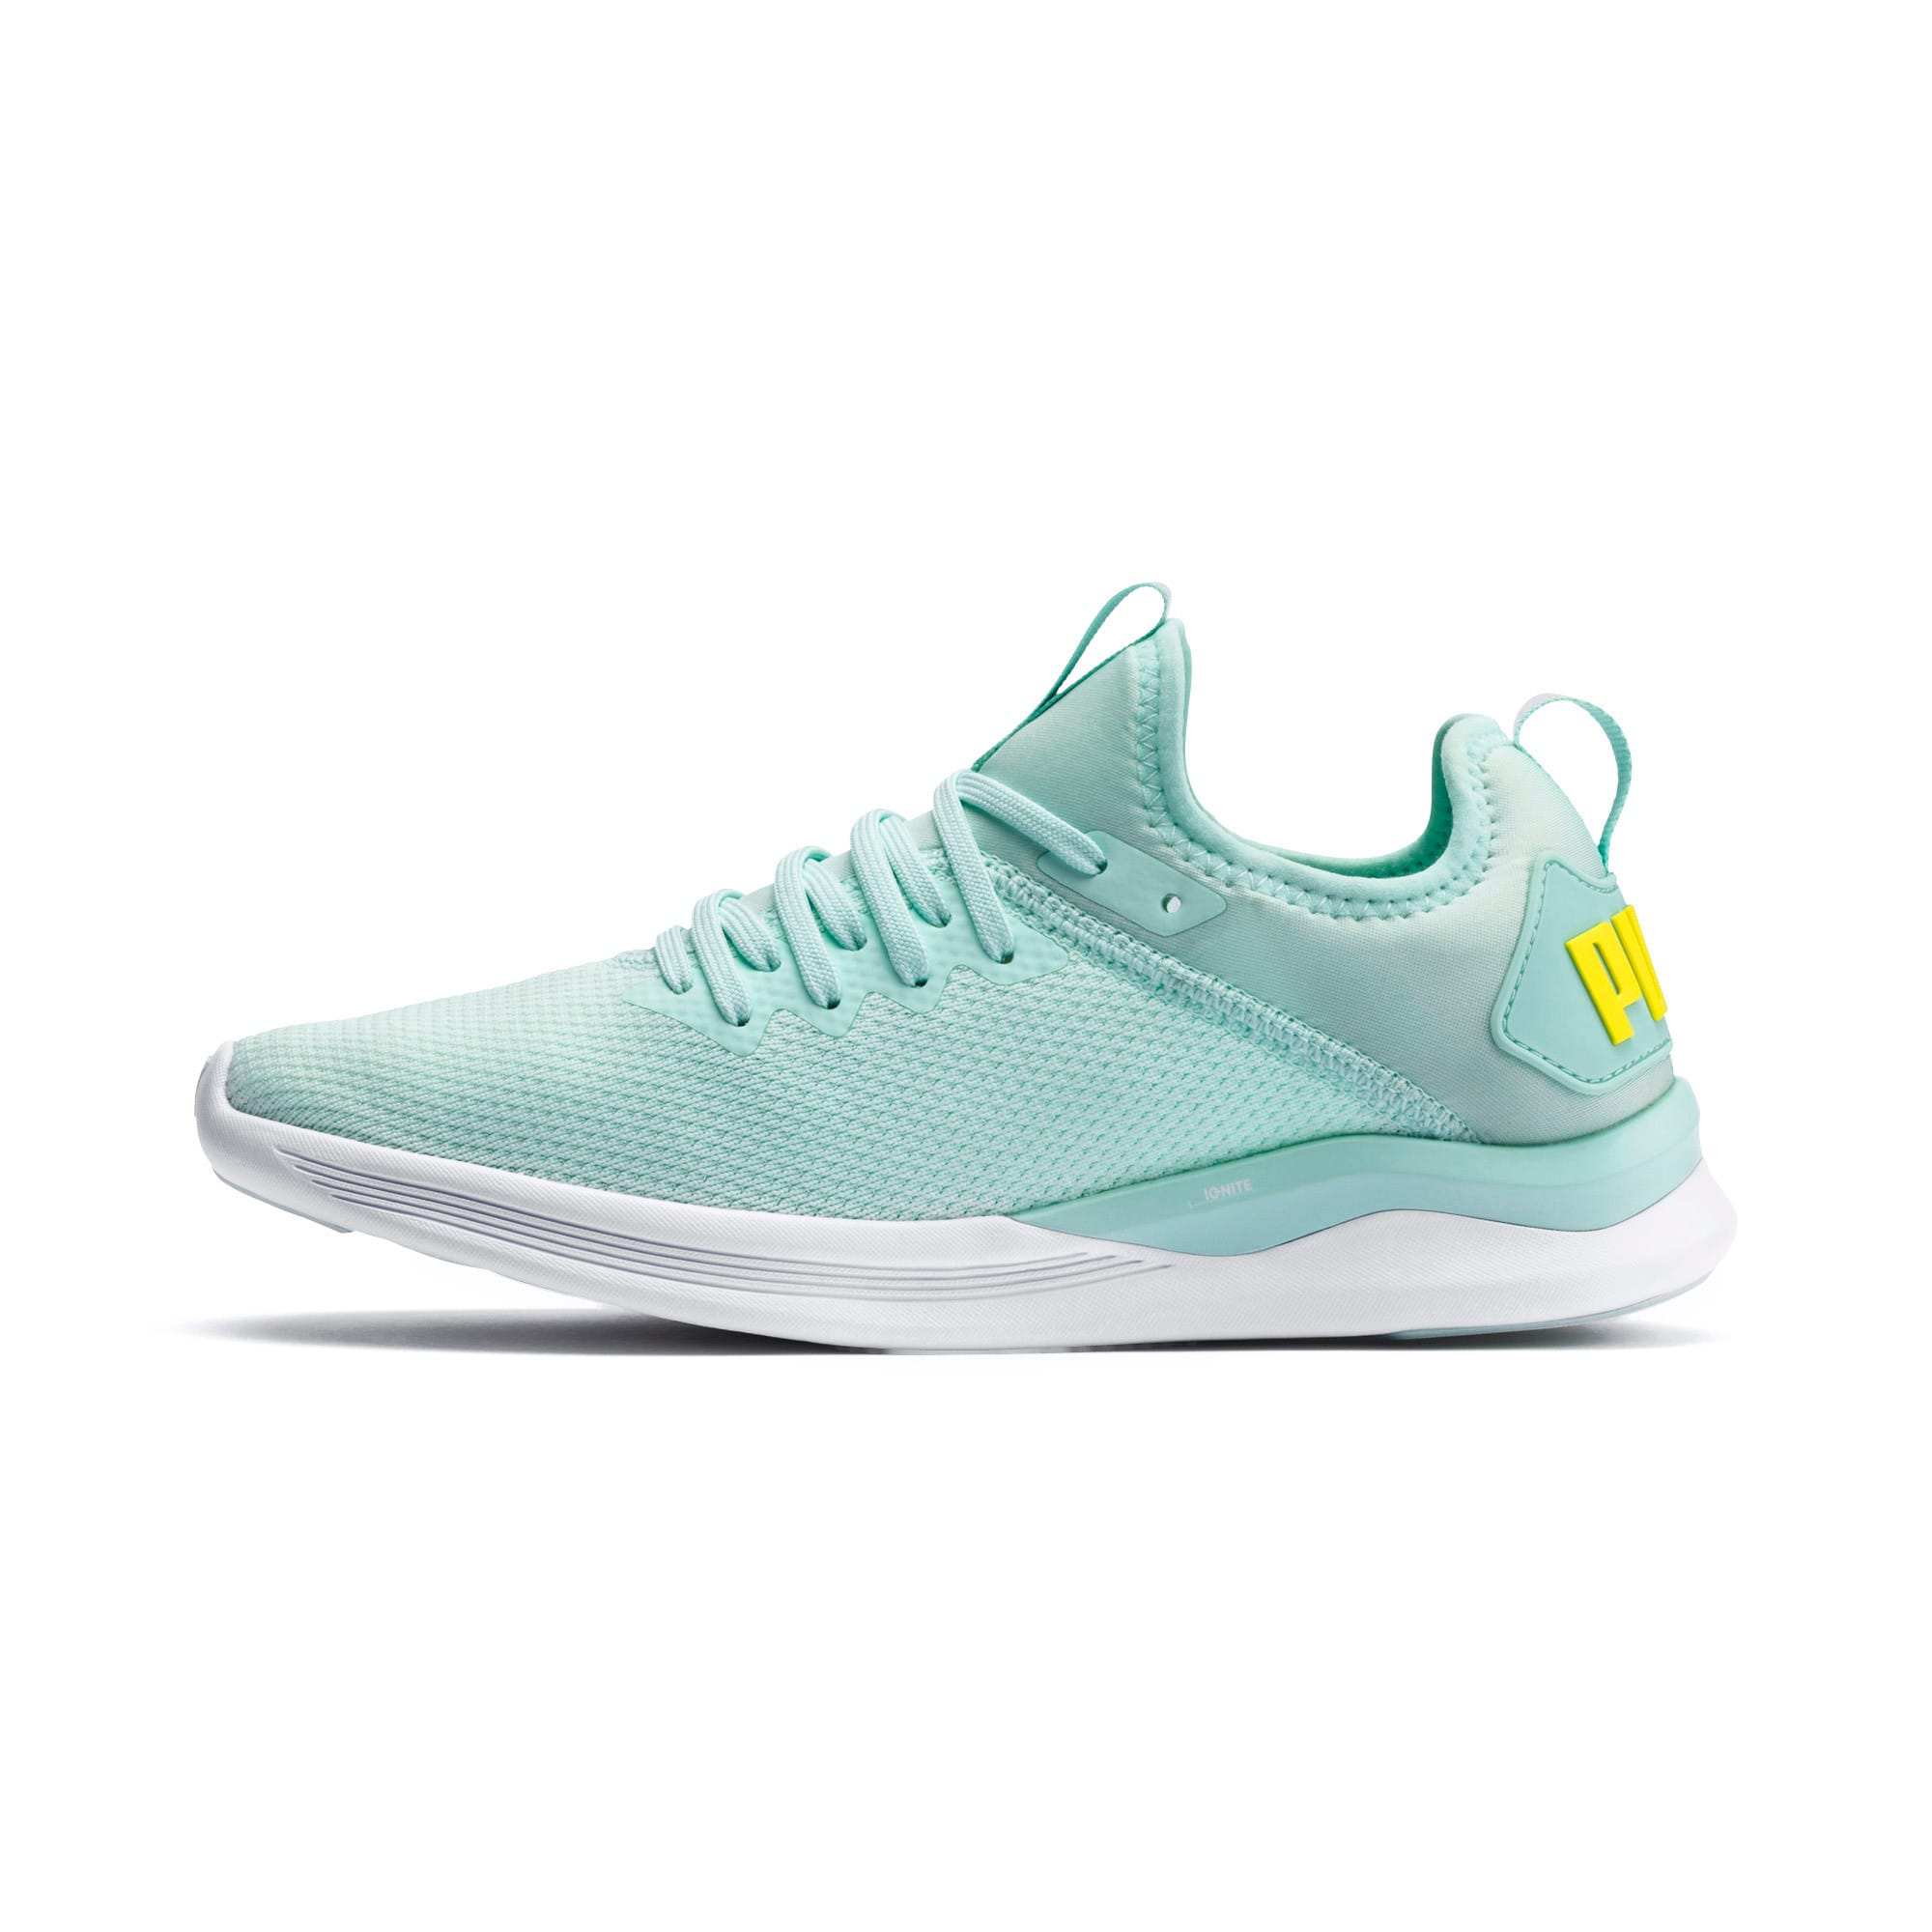 Thumbnail 1 of IGNITE Flash evoKNIT Women's Running Shoes, Fair Aqua-Blazing Yellow, medium-IND